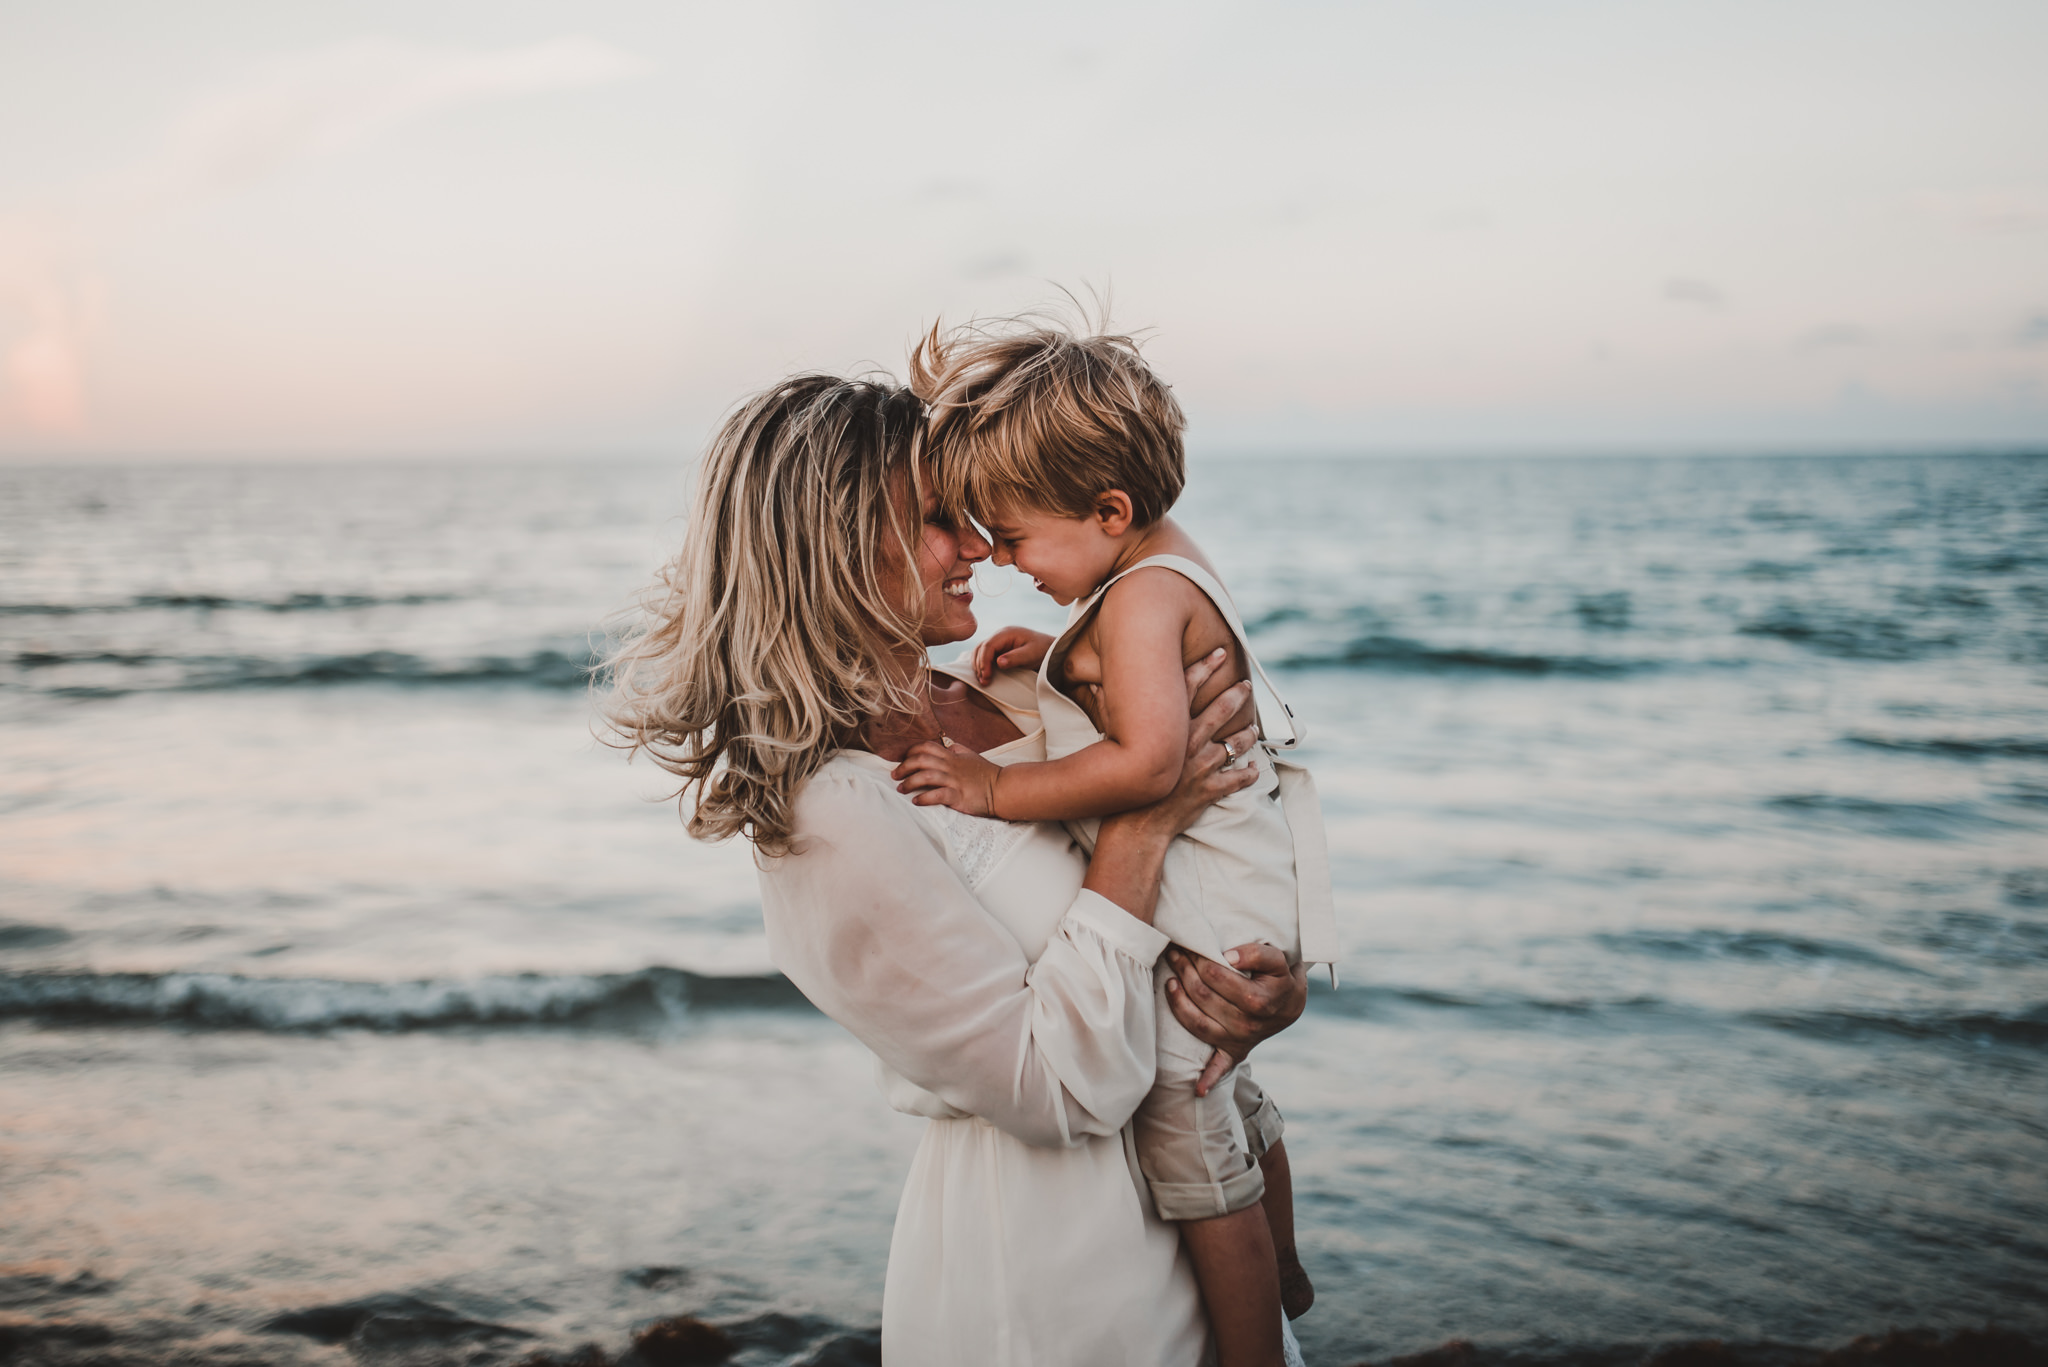 twyla jones photography - treasure coast florida - mother son at the beach--31.jpg